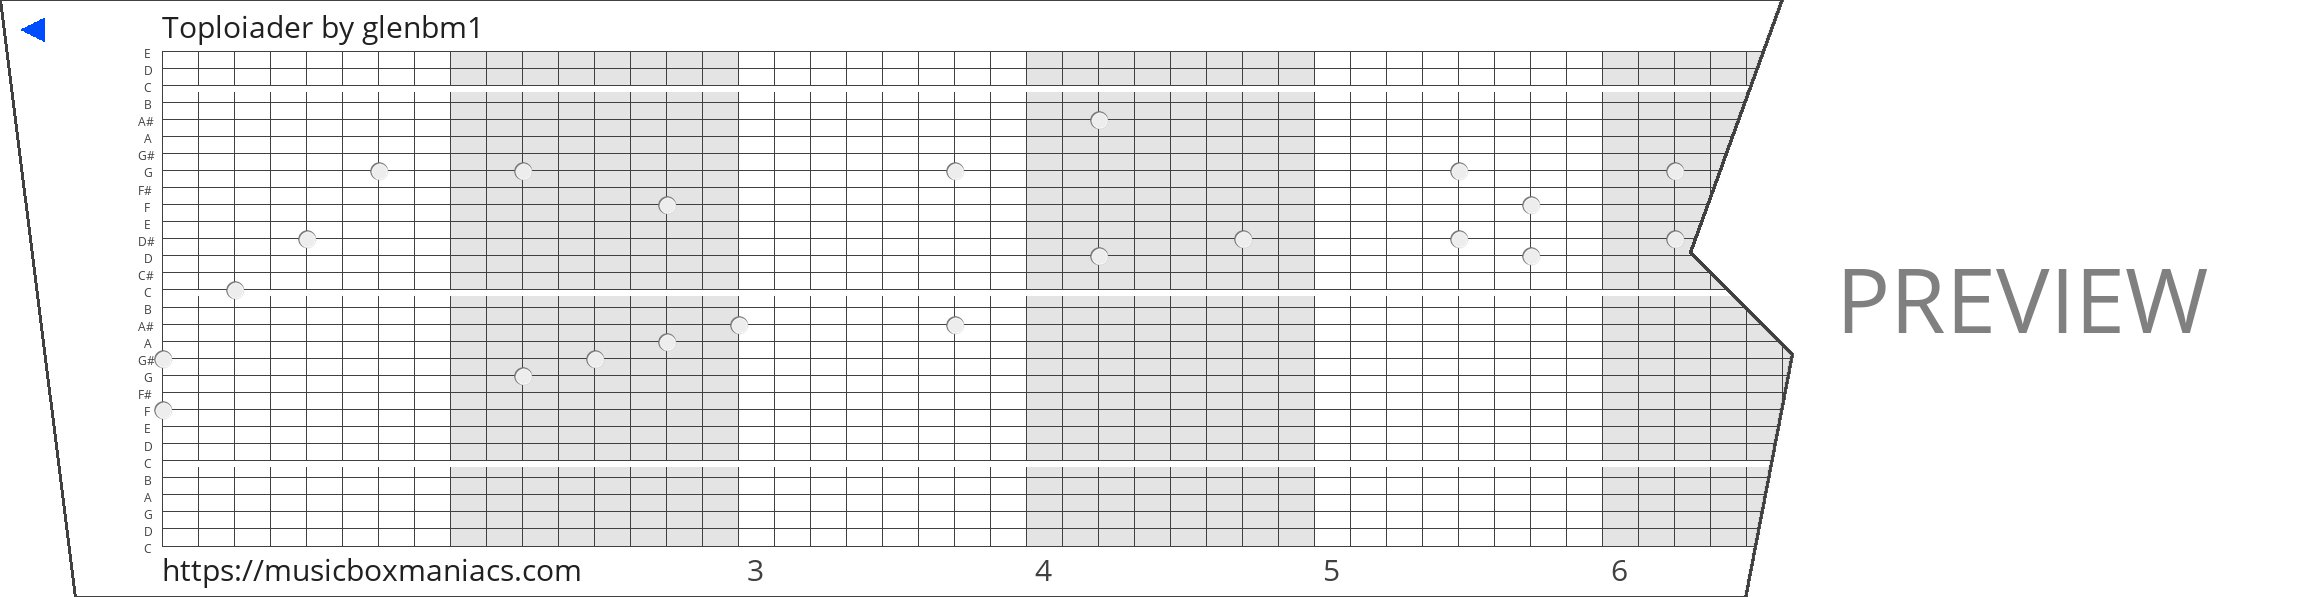 Toploiader 30 note music box paper strip